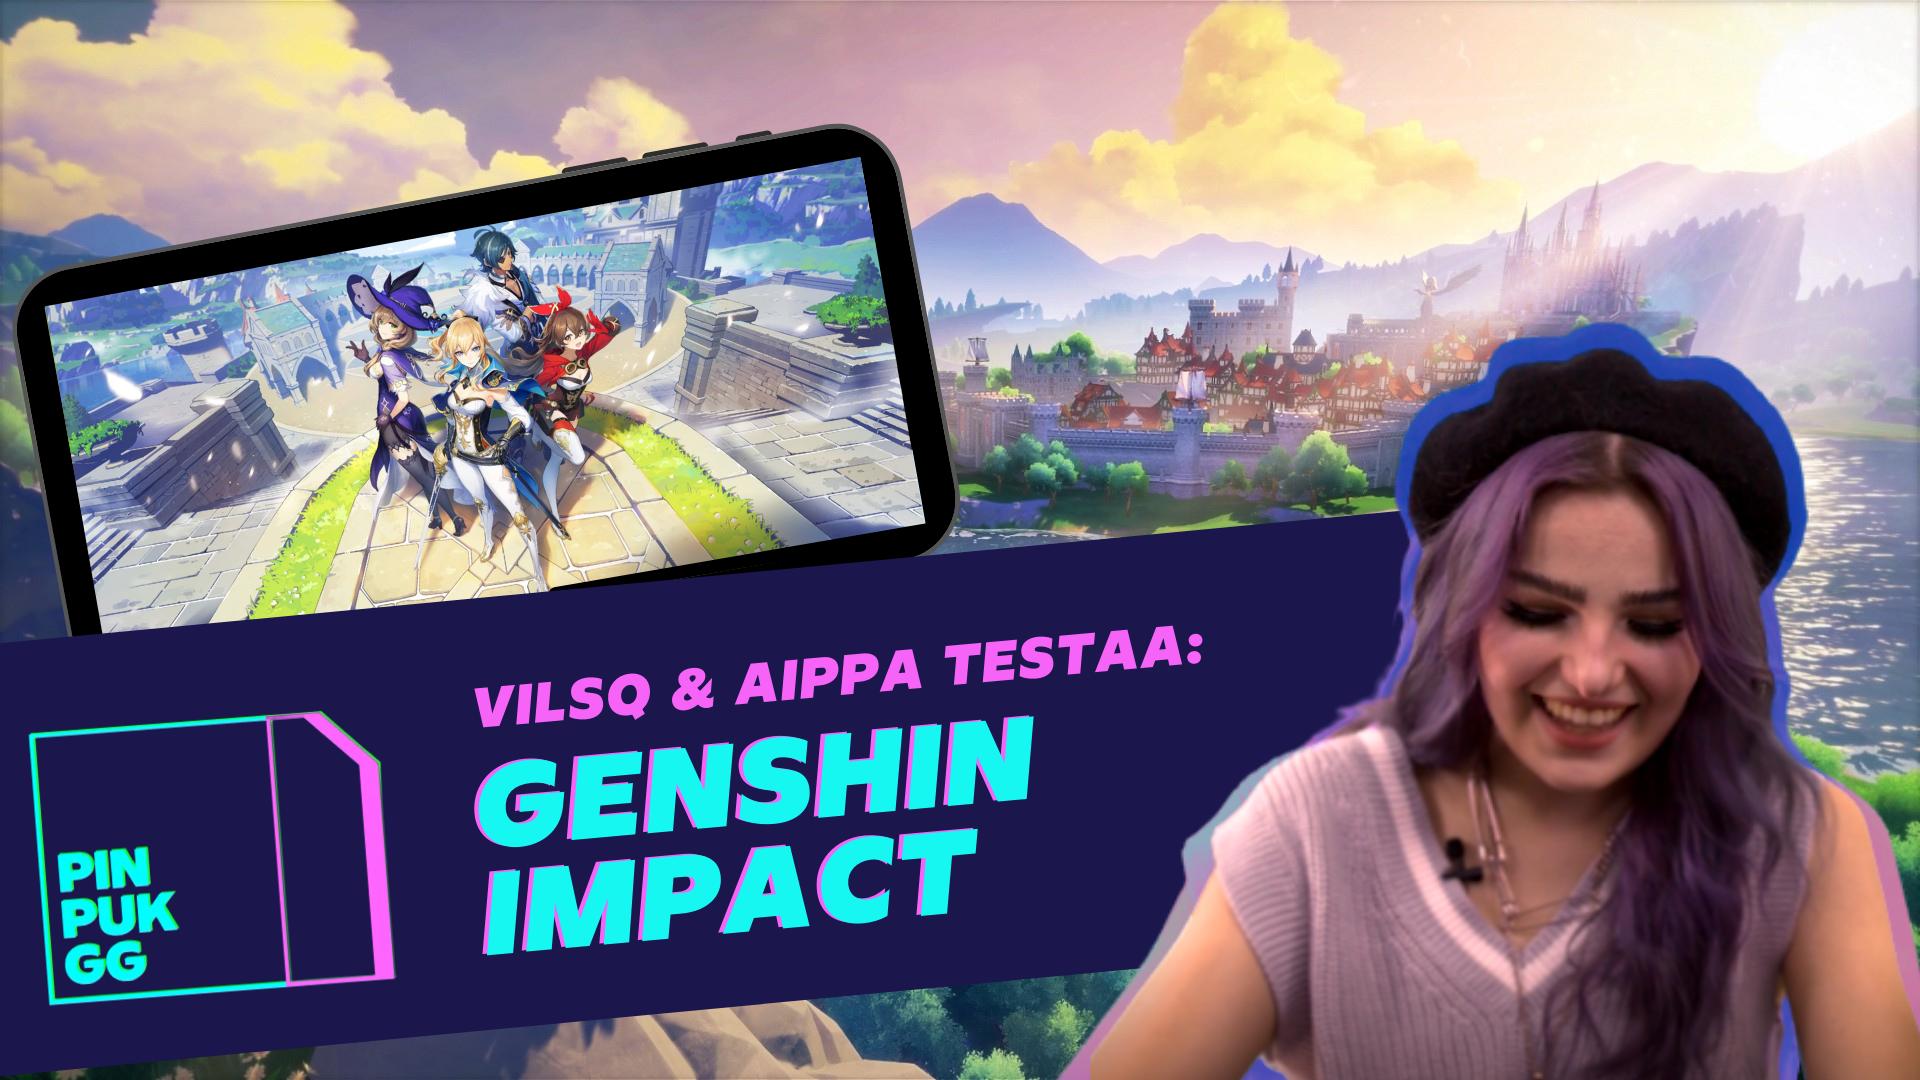 Genshin Impact mobile